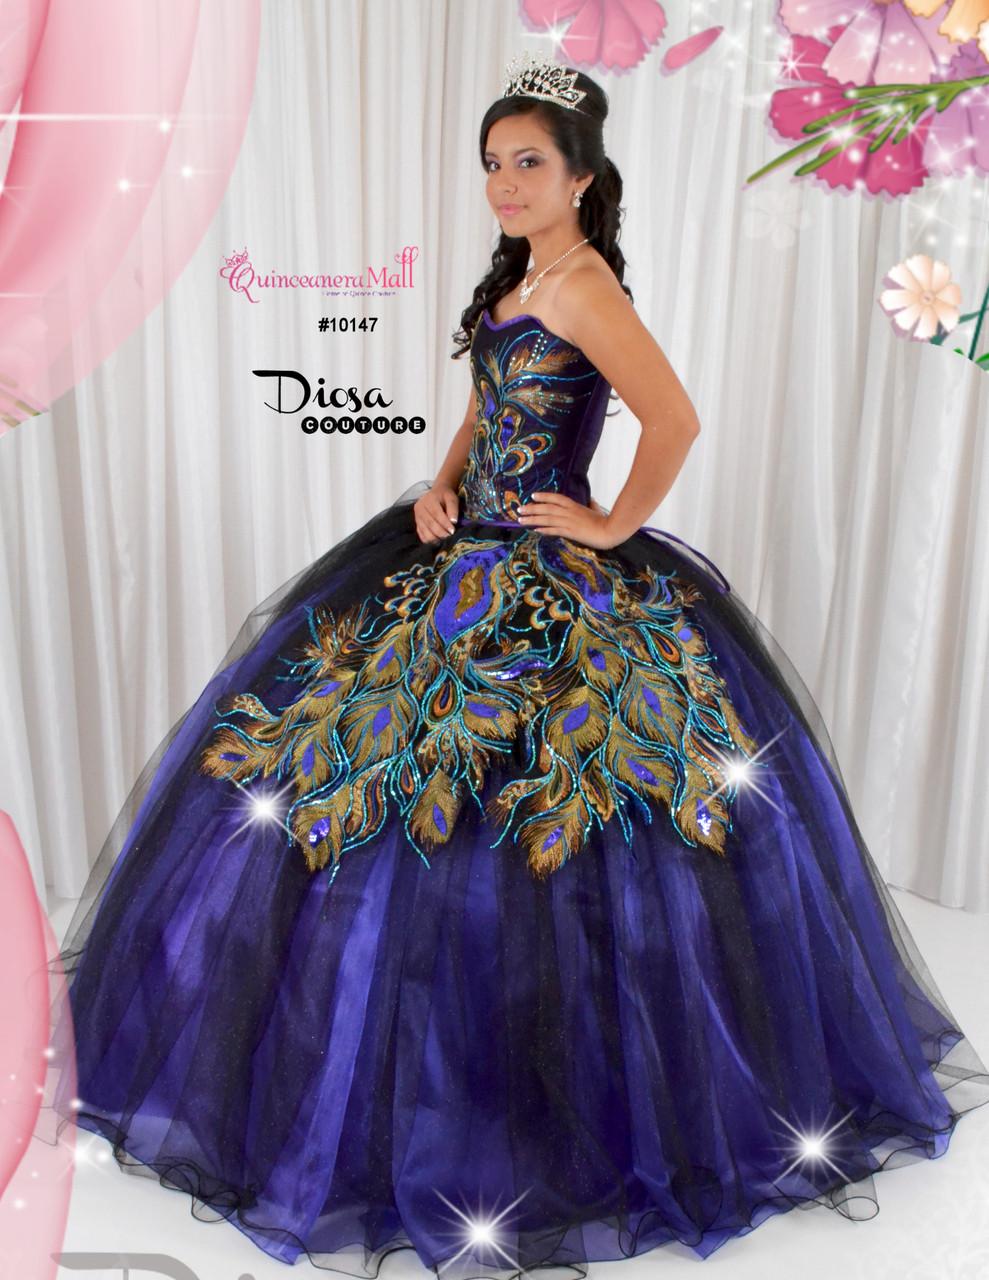 20066747296 Quinceanera Peacock Dress  10147JES - Joyful Events Store